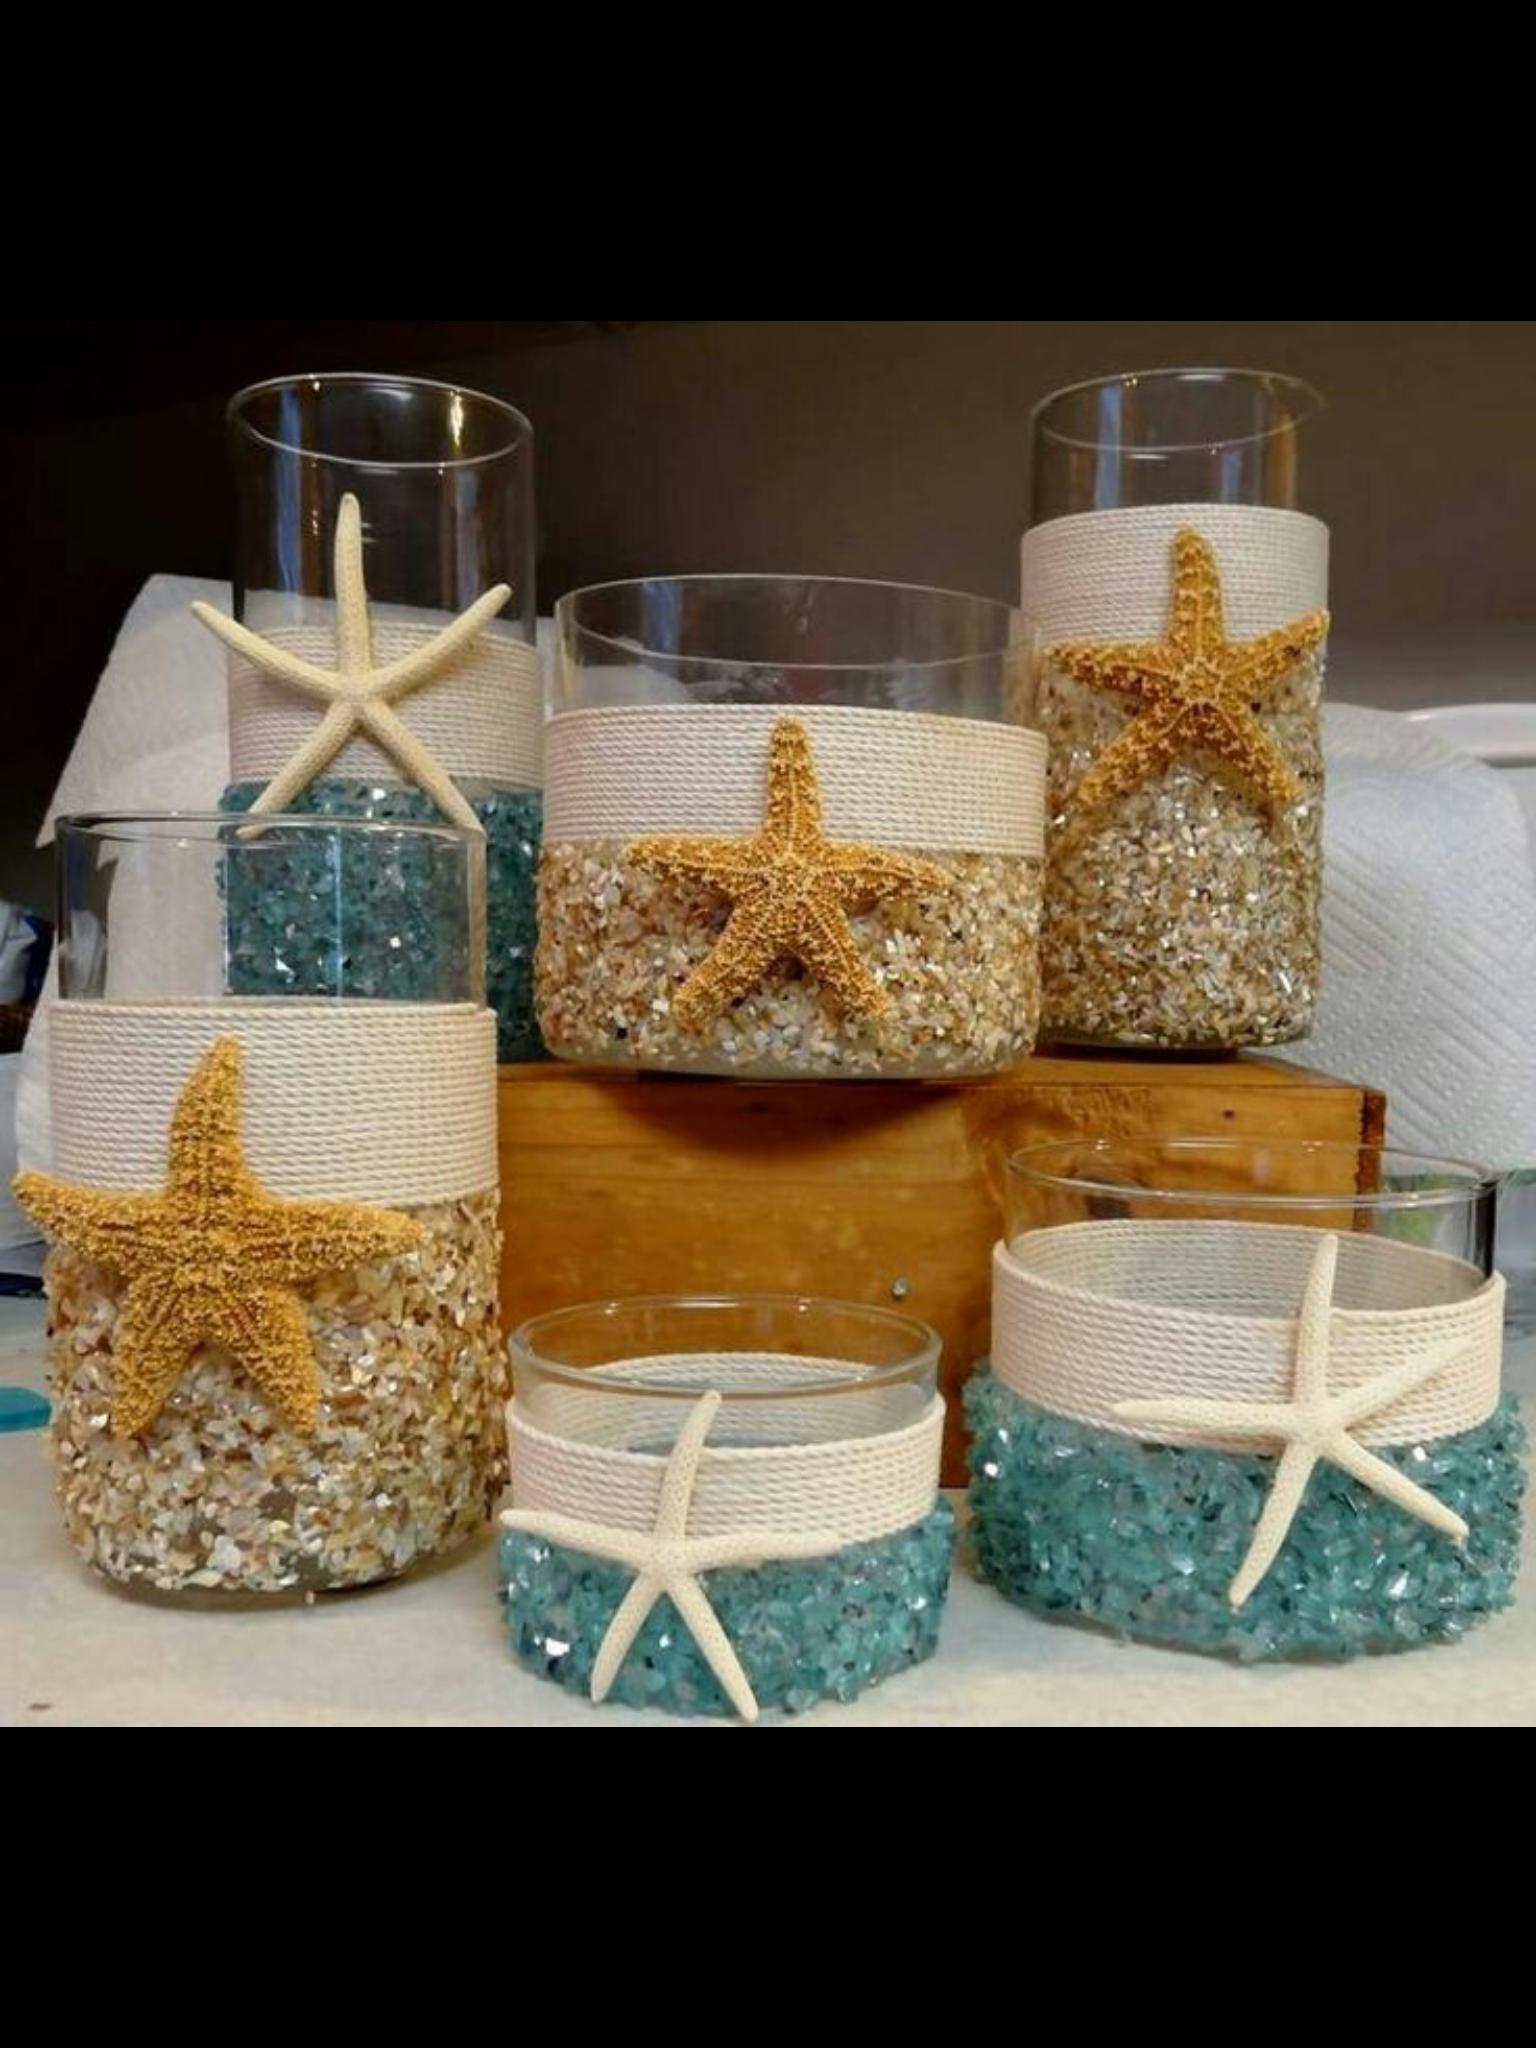 Pin By Salmaalmamari22 On Seashell Crafts In 2020 Beach Candle Beach Diy Beach Candle Holder